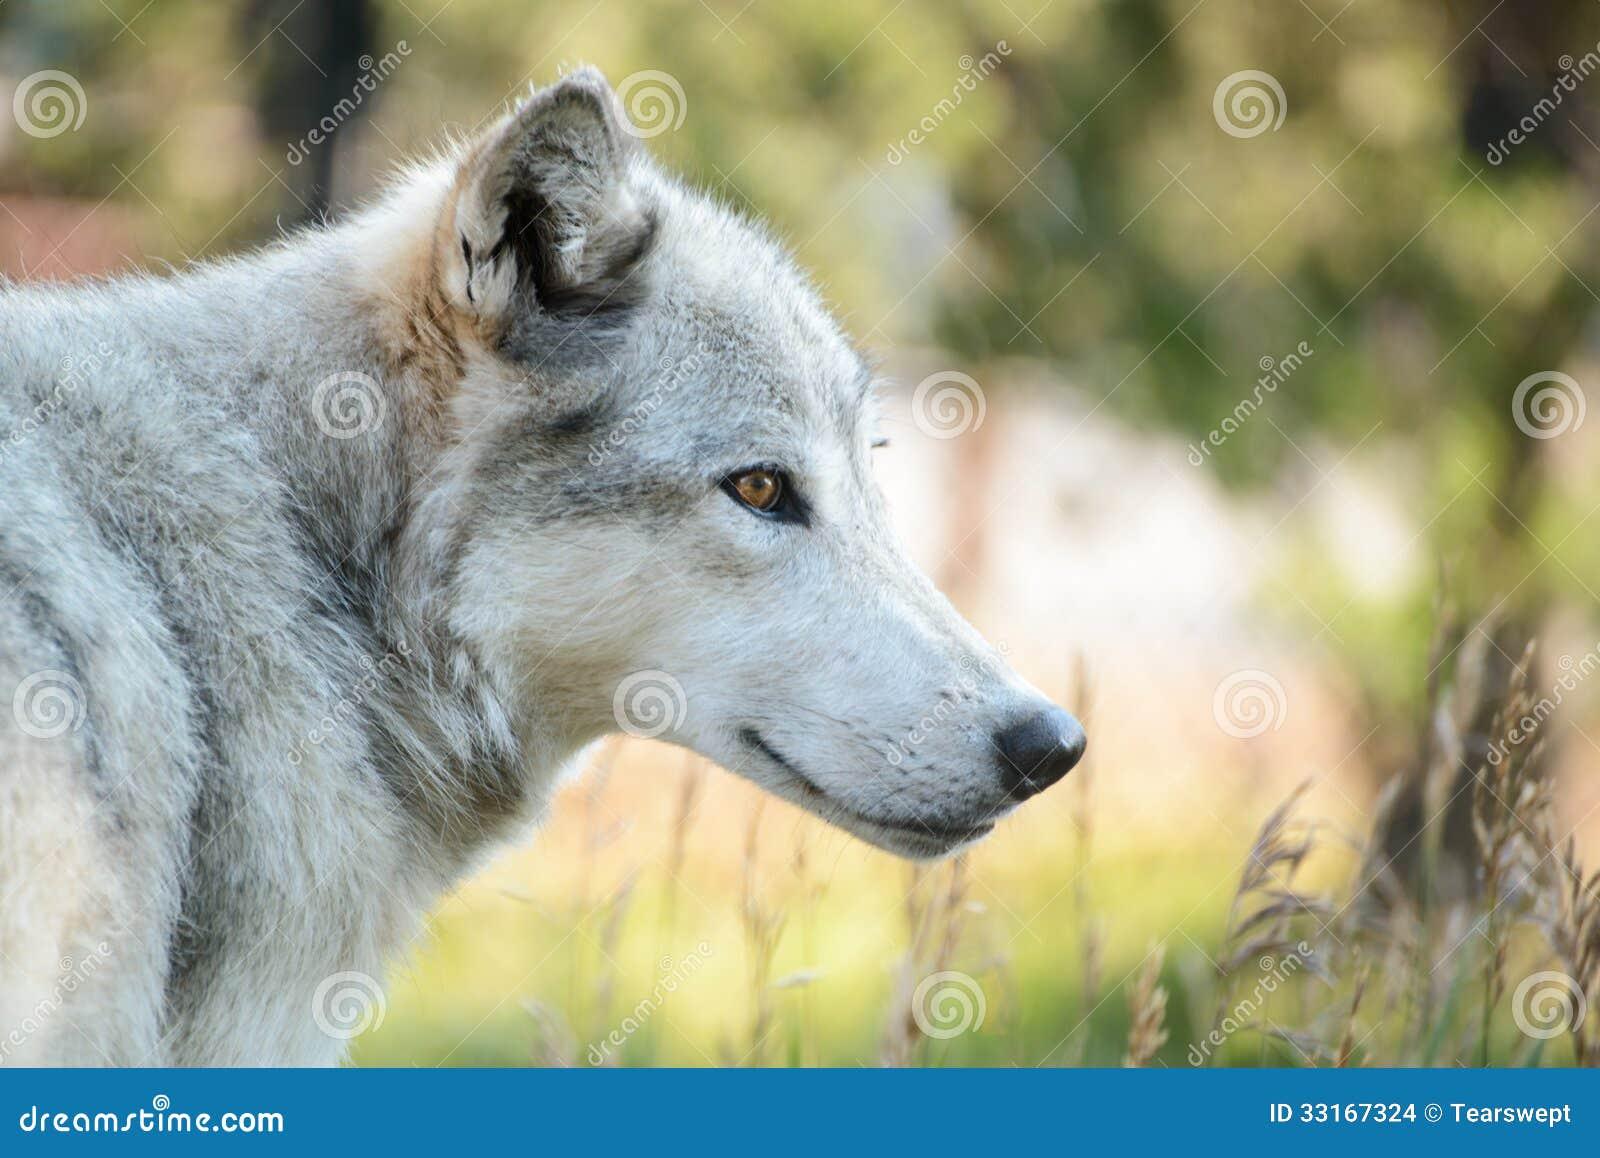 Wolf Profile Stock Photo Image Of Park Yellow Wild 33167324